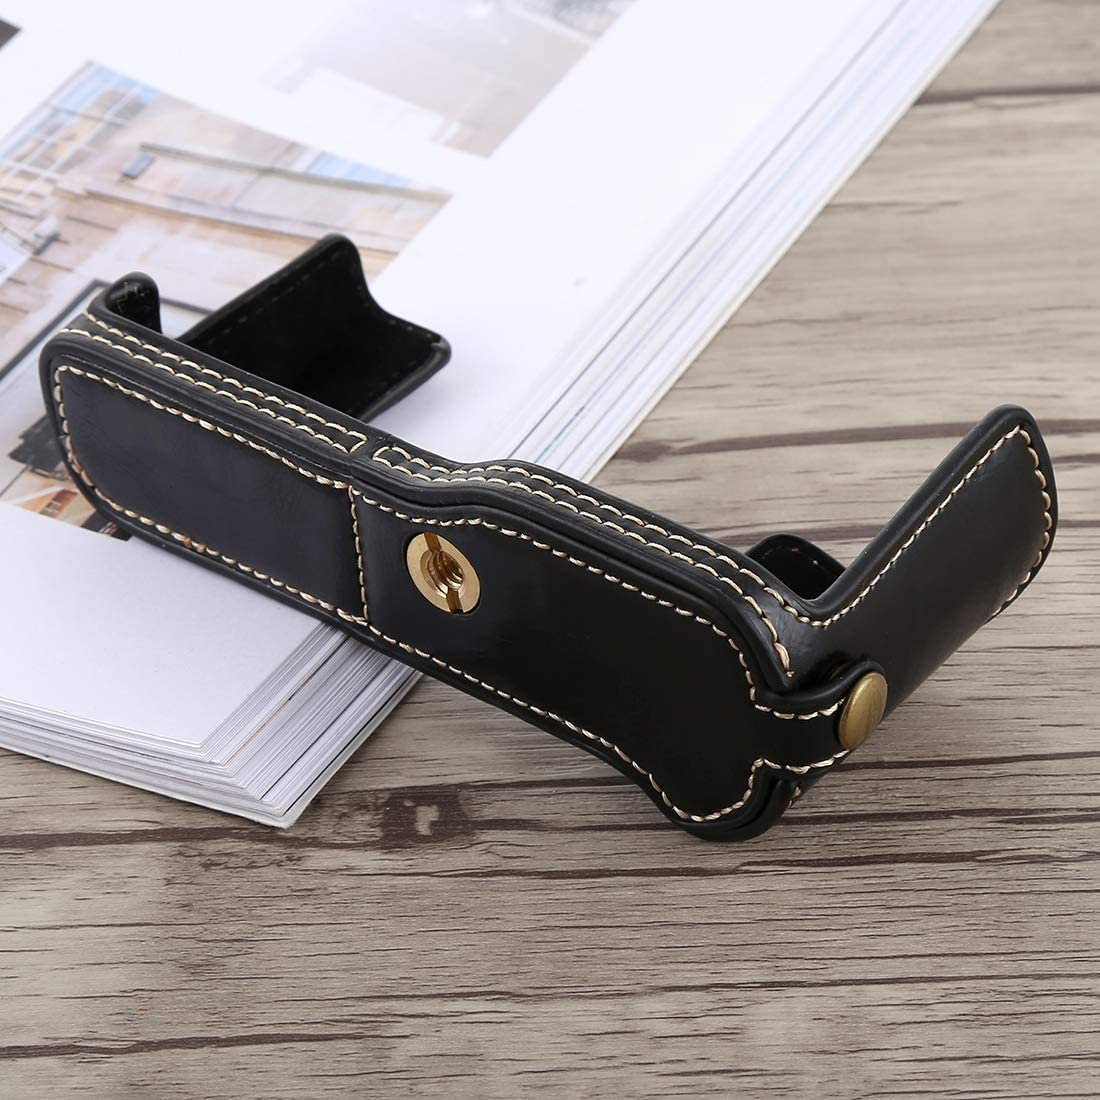 Black YANTAIANJANE Camera Accessories 1//4 inch Thread PU Leather Camera Half Case Base for FUJIFILM X-T10 Color : Coffee X-T20